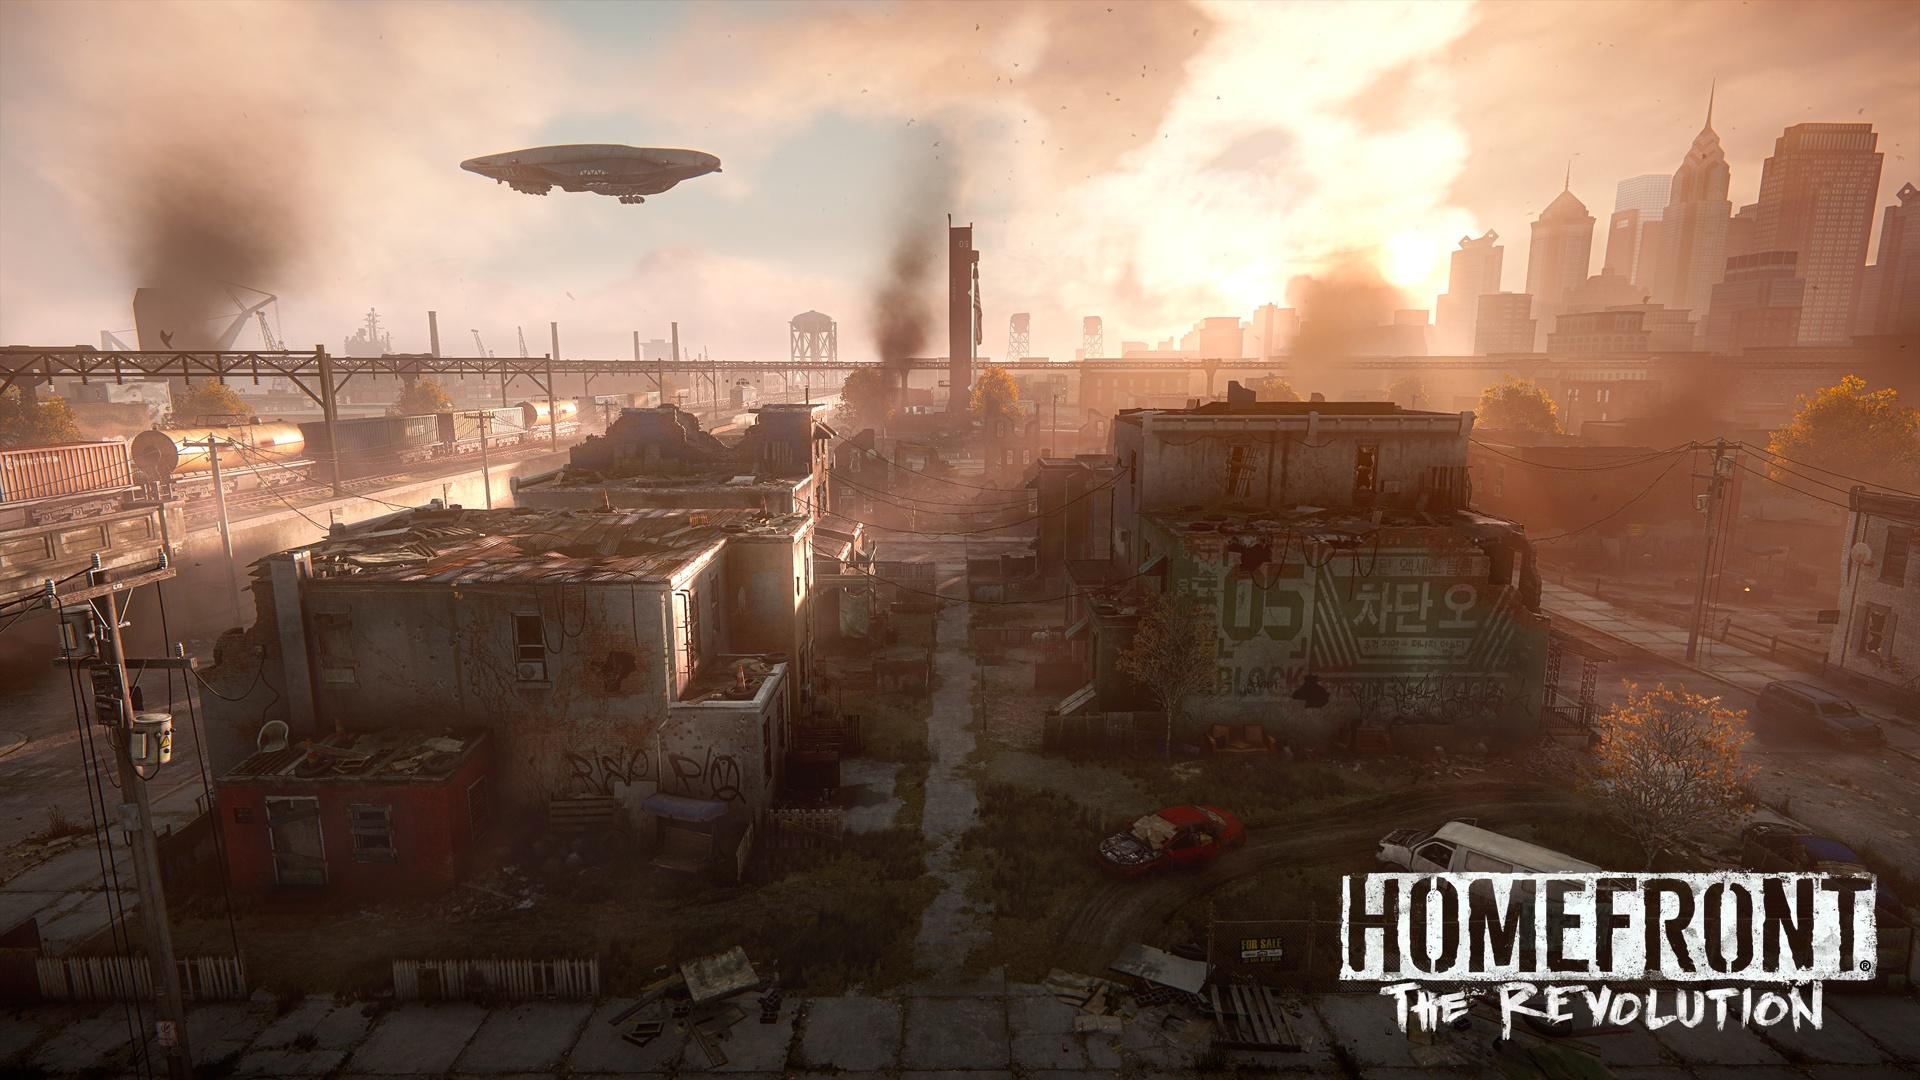 HOMEFRONT THE REVOLUTION 6